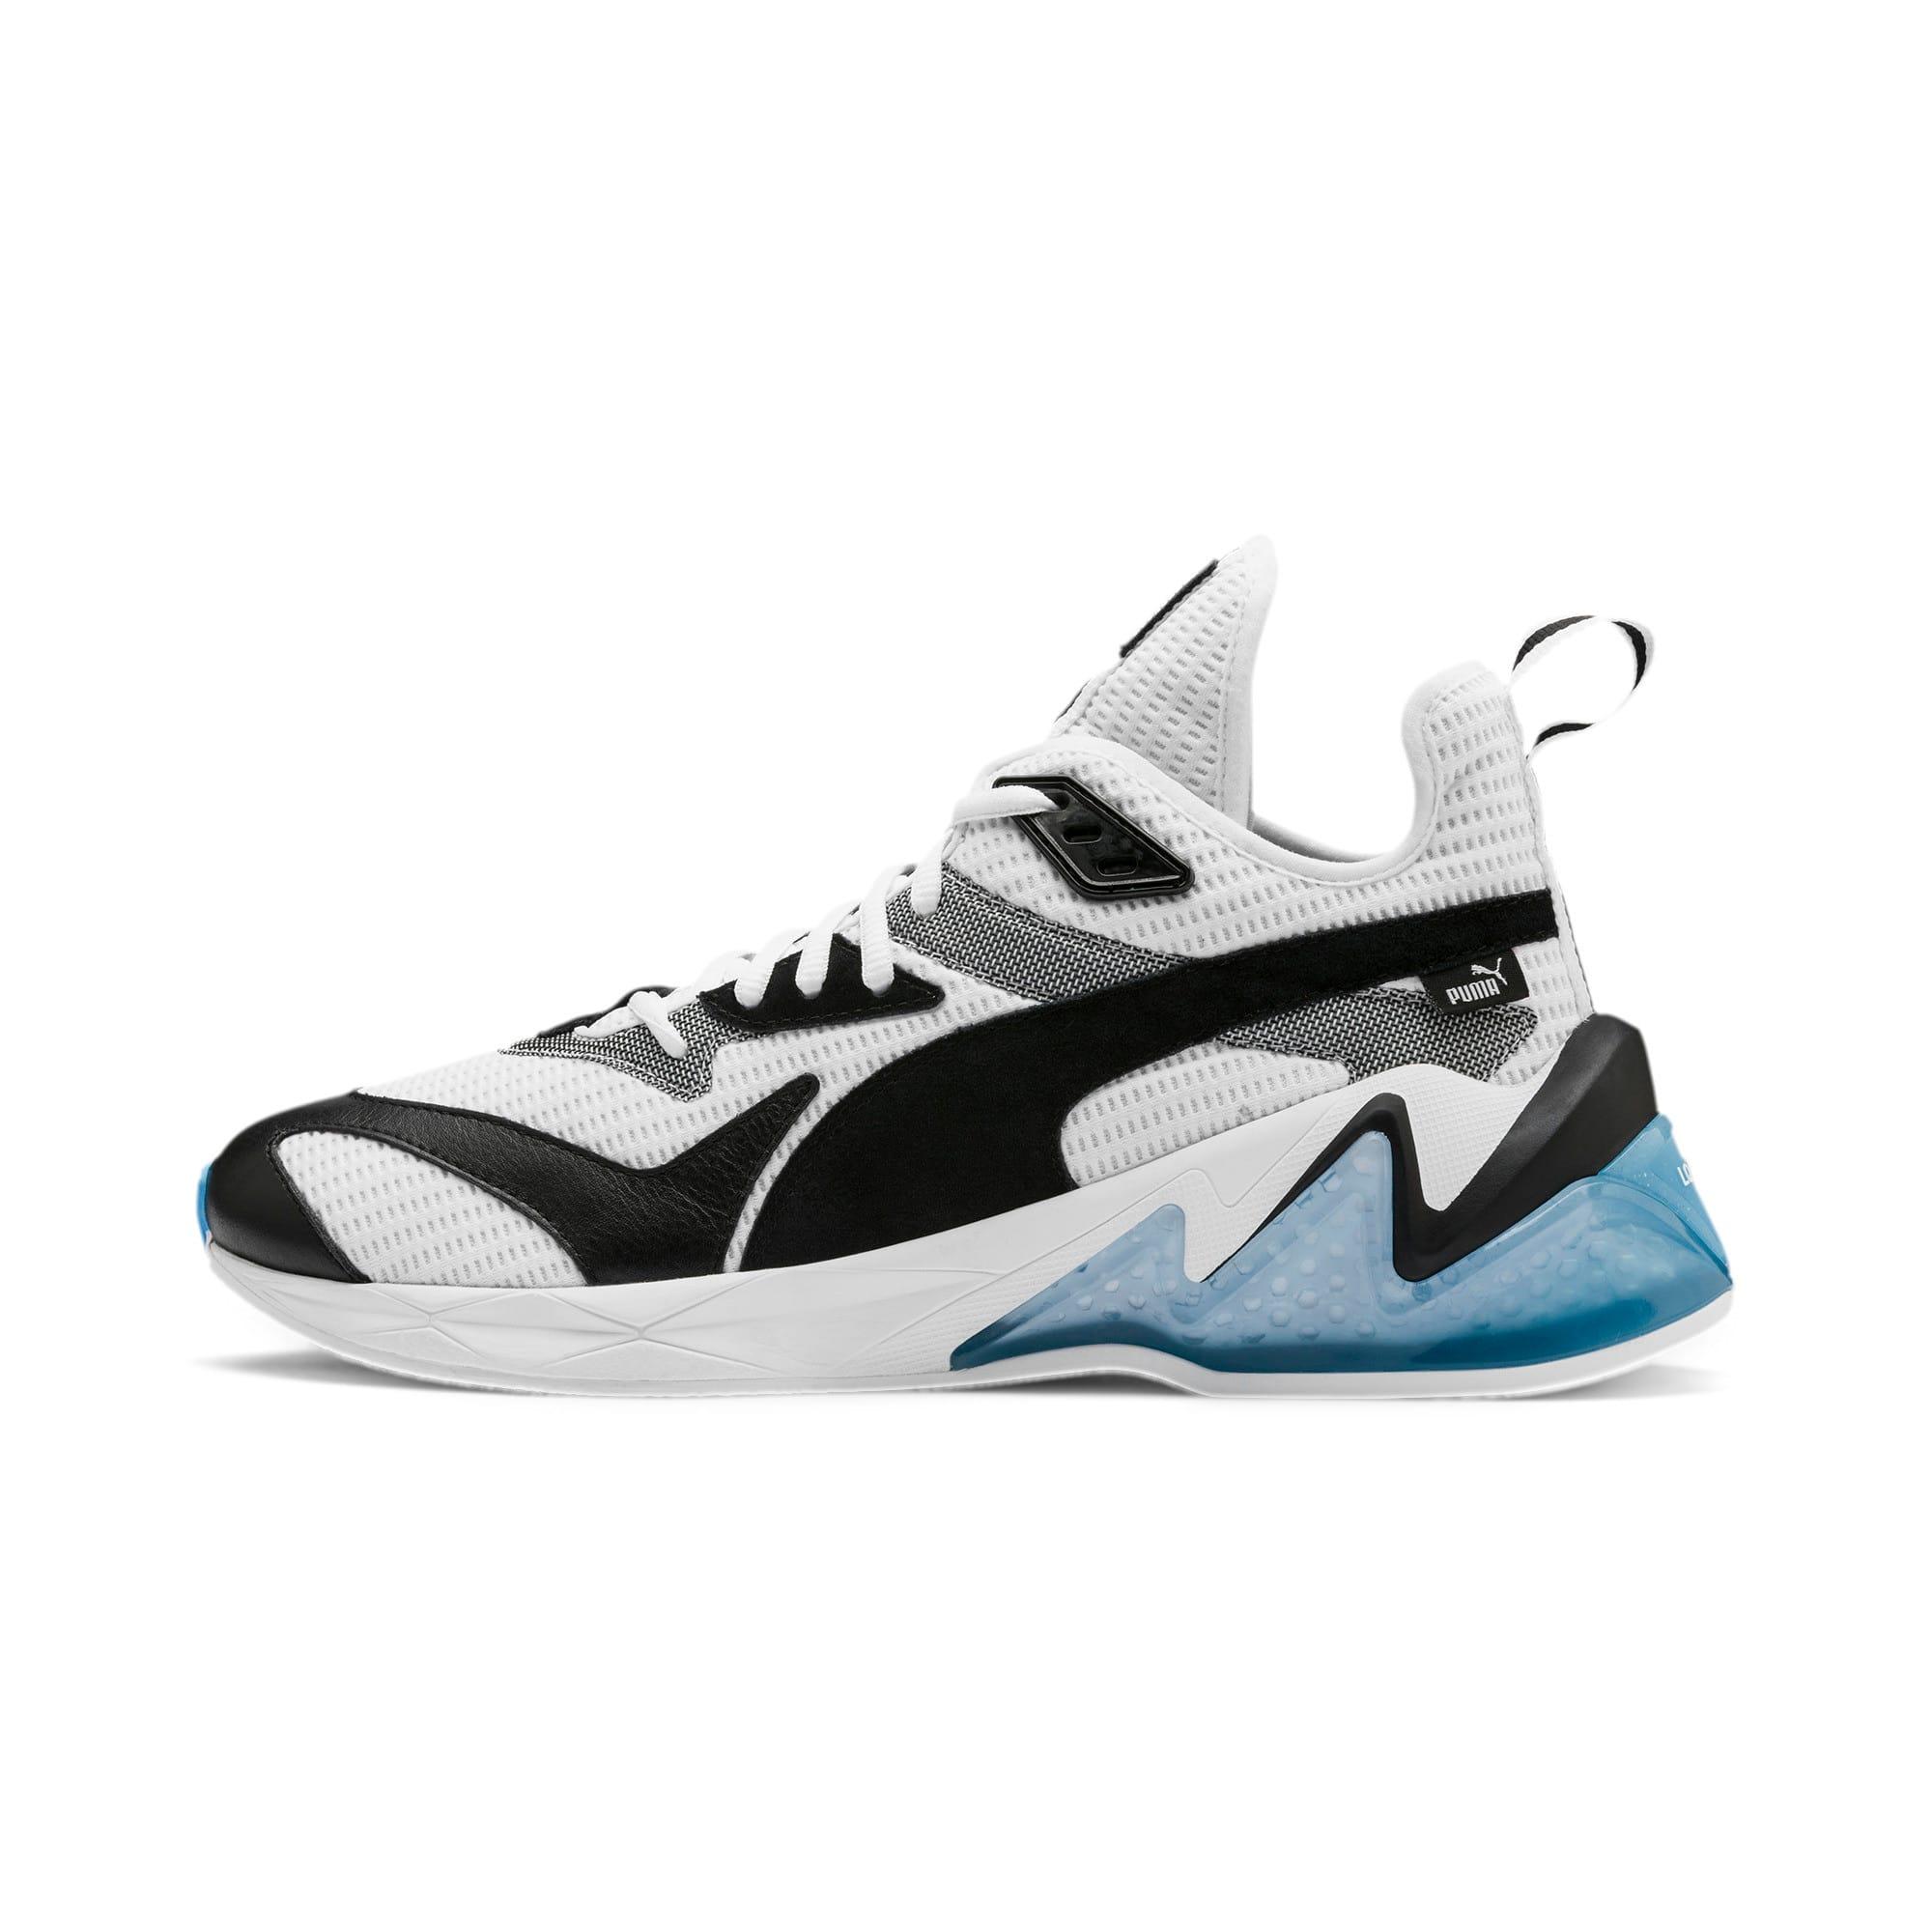 Thumbnail 1 of LQDCELL Origin Men's Training Shoes, Puma White-Puma Black, medium